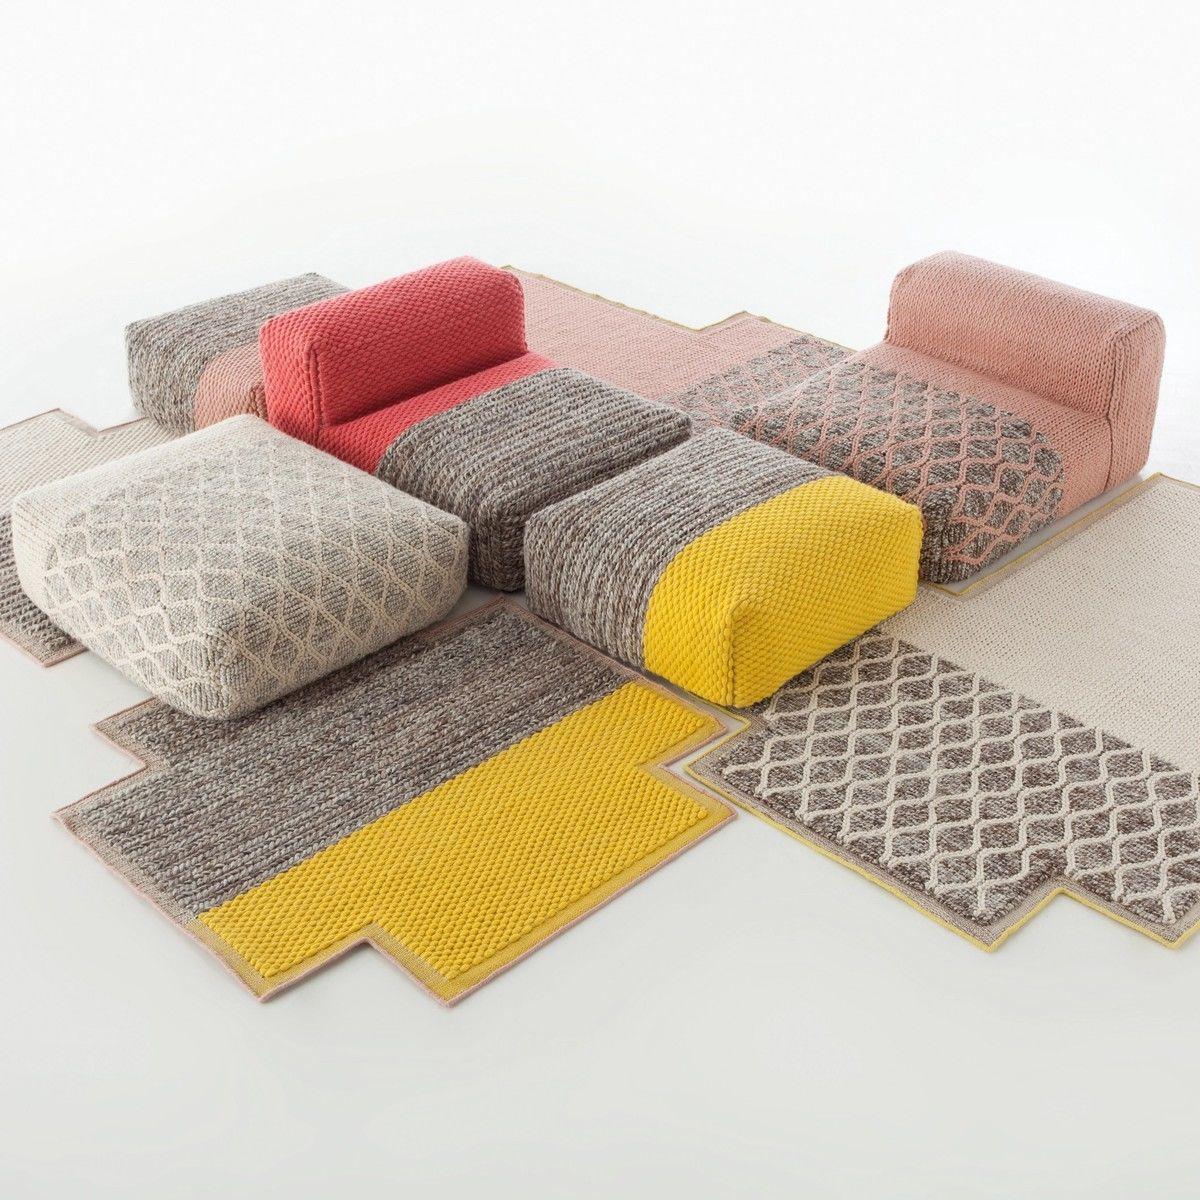 mangas space square pouf gan. Black Bedroom Furniture Sets. Home Design Ideas